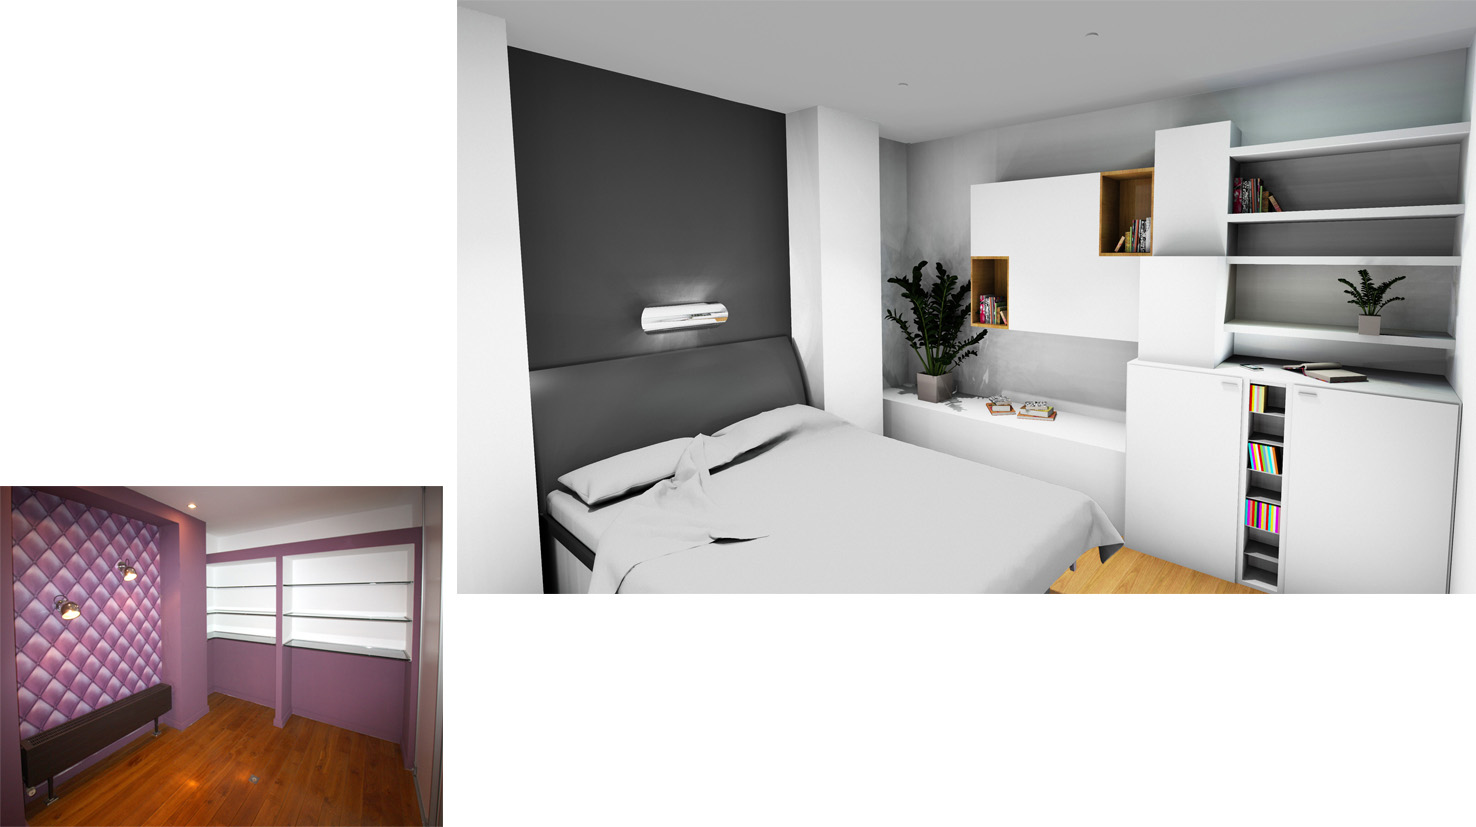 home staging loft boddaert interieur architecte interieur lille nord. Black Bedroom Furniture Sets. Home Design Ideas